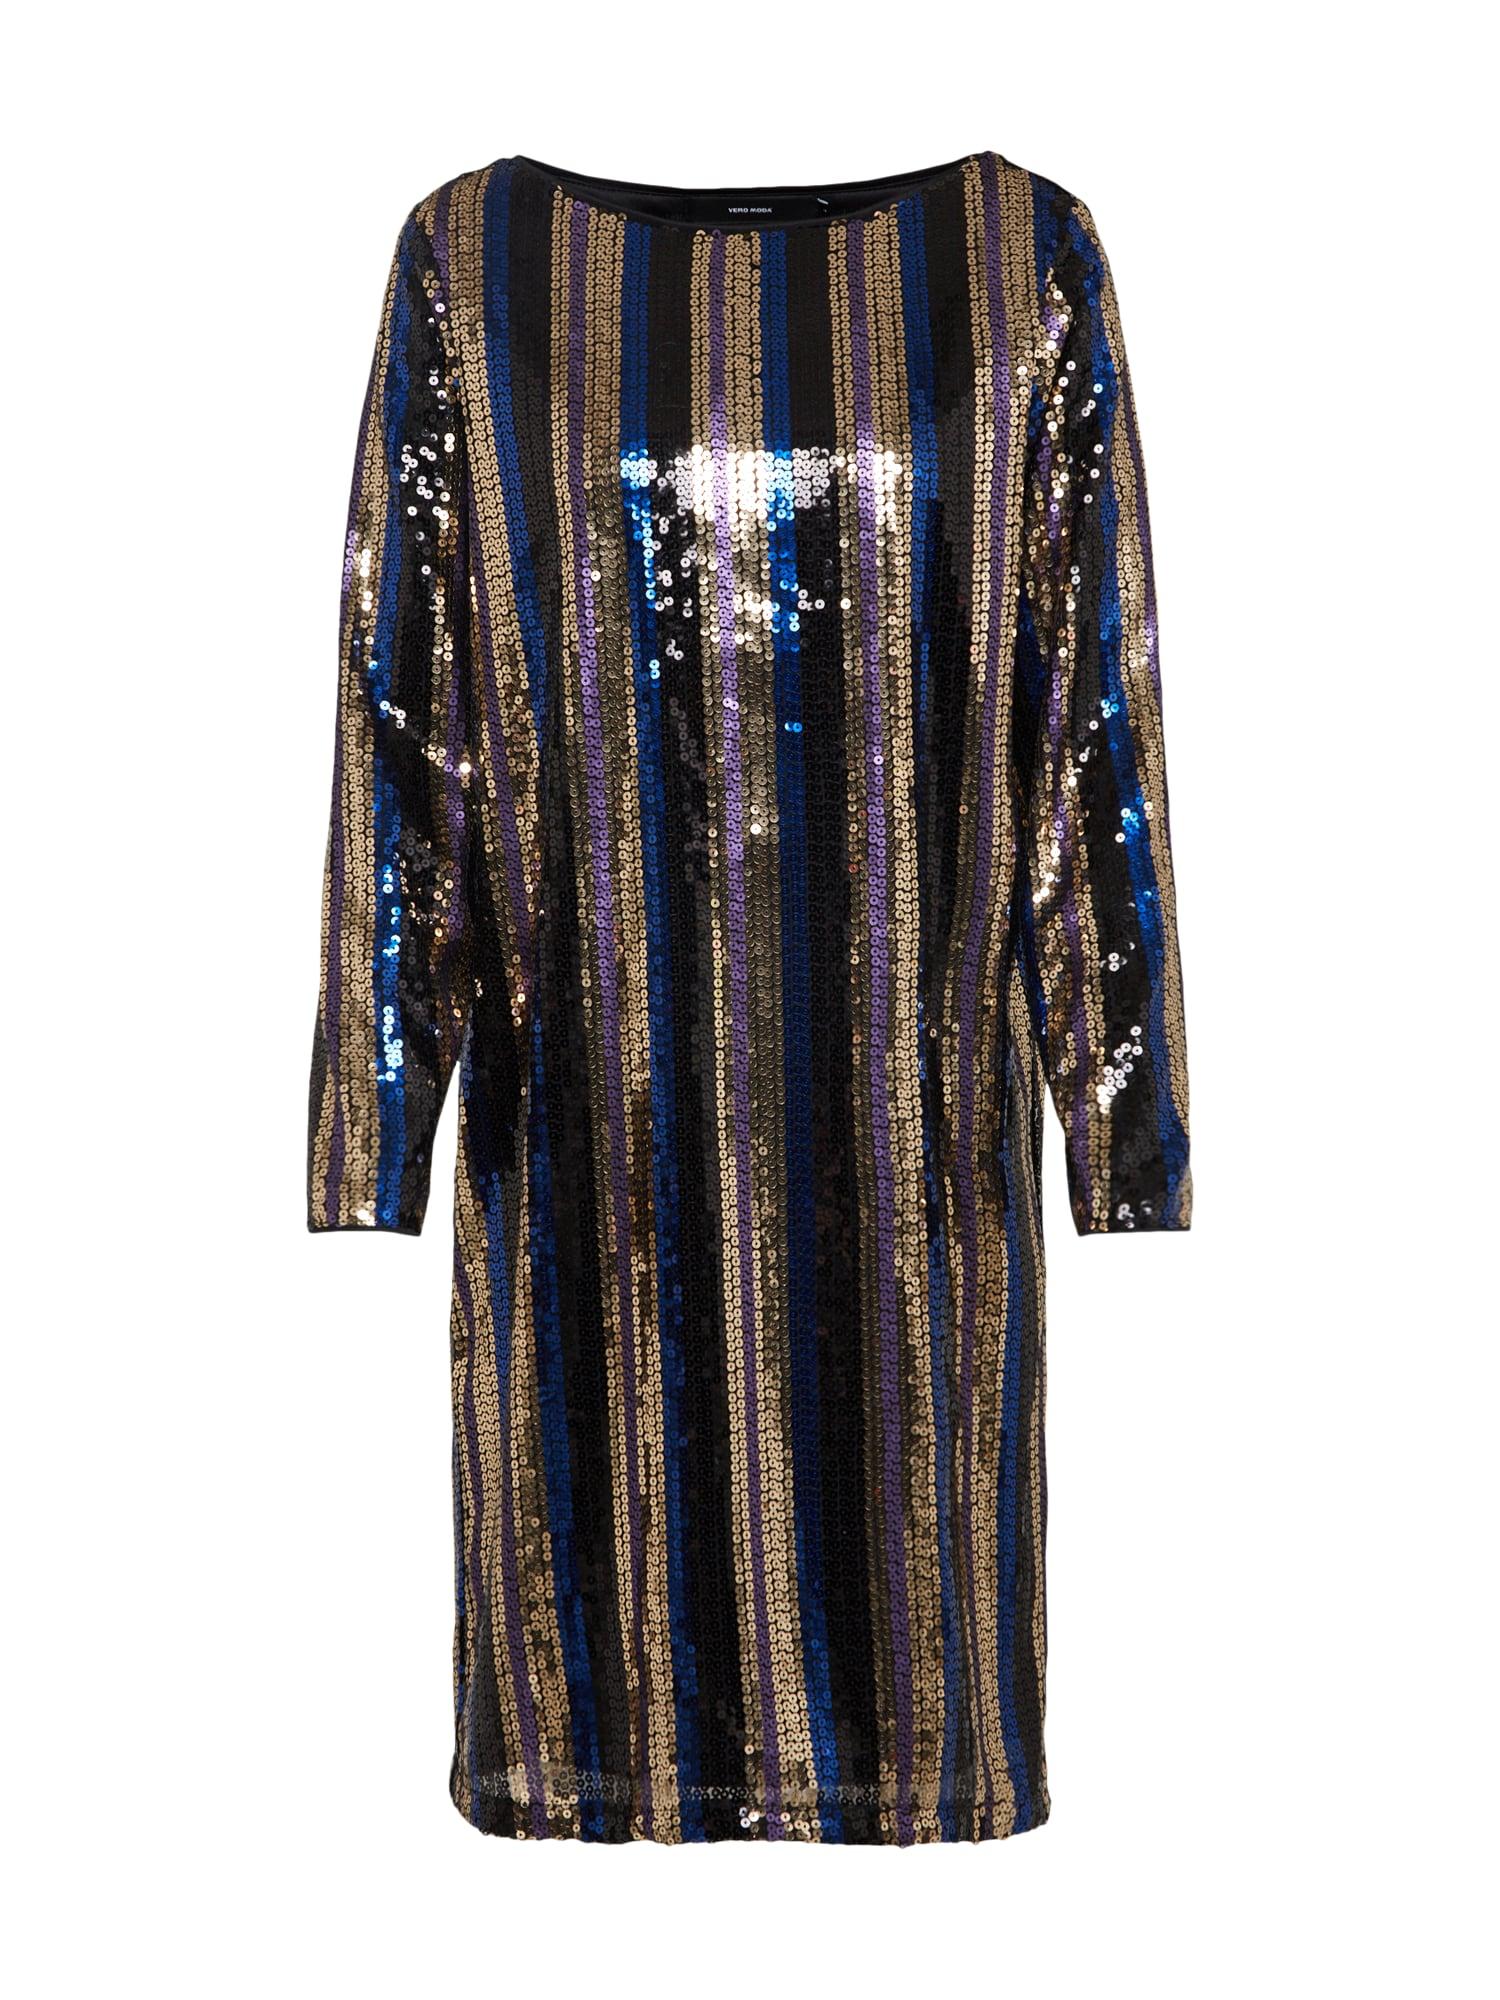 VERO MODA, Dames Cocktailjurk 'DORIS BOATNECK DRESS', navy / goud / zwart